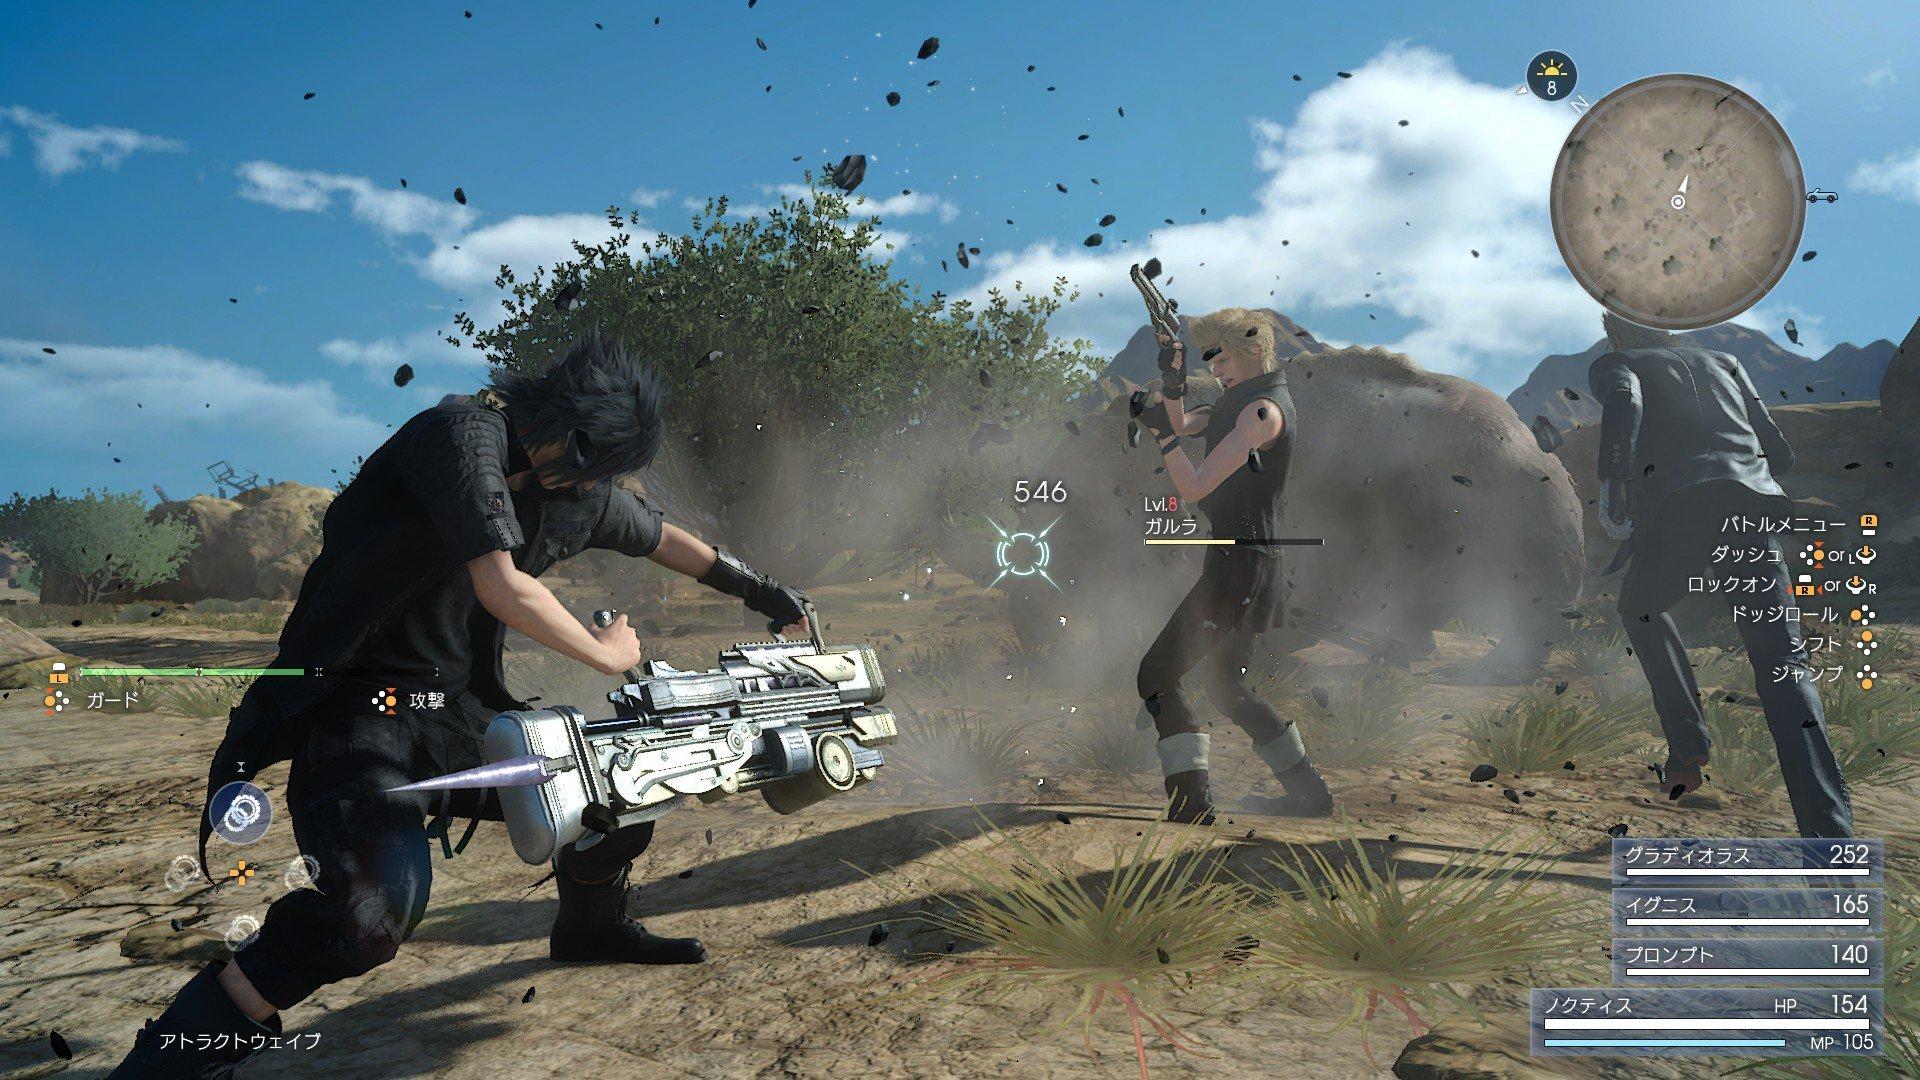 Final-Fantasy-XV-Machinery-01